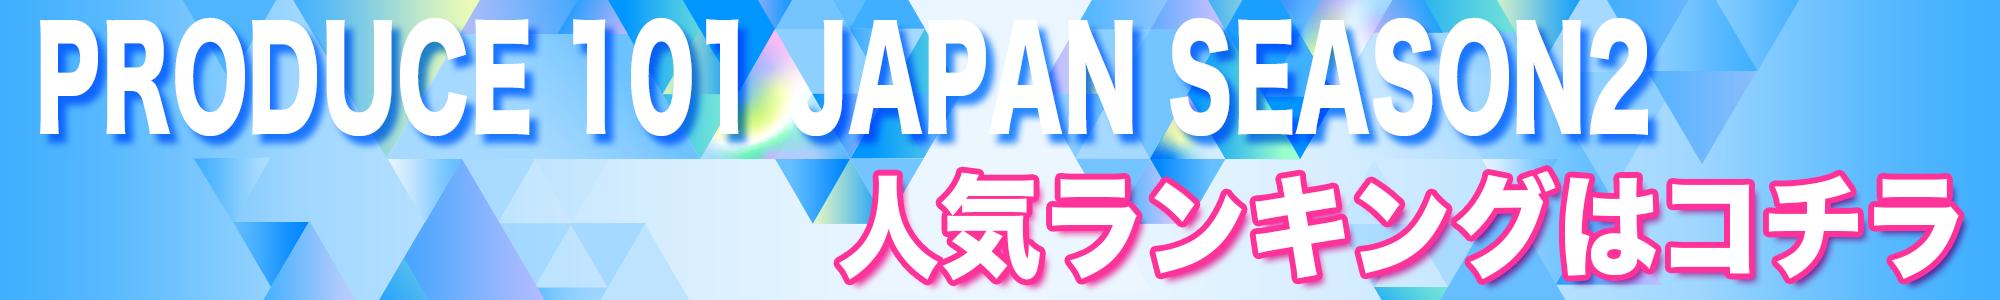 PRODUCE 101 JAPAN SEASON2 人気ランキング